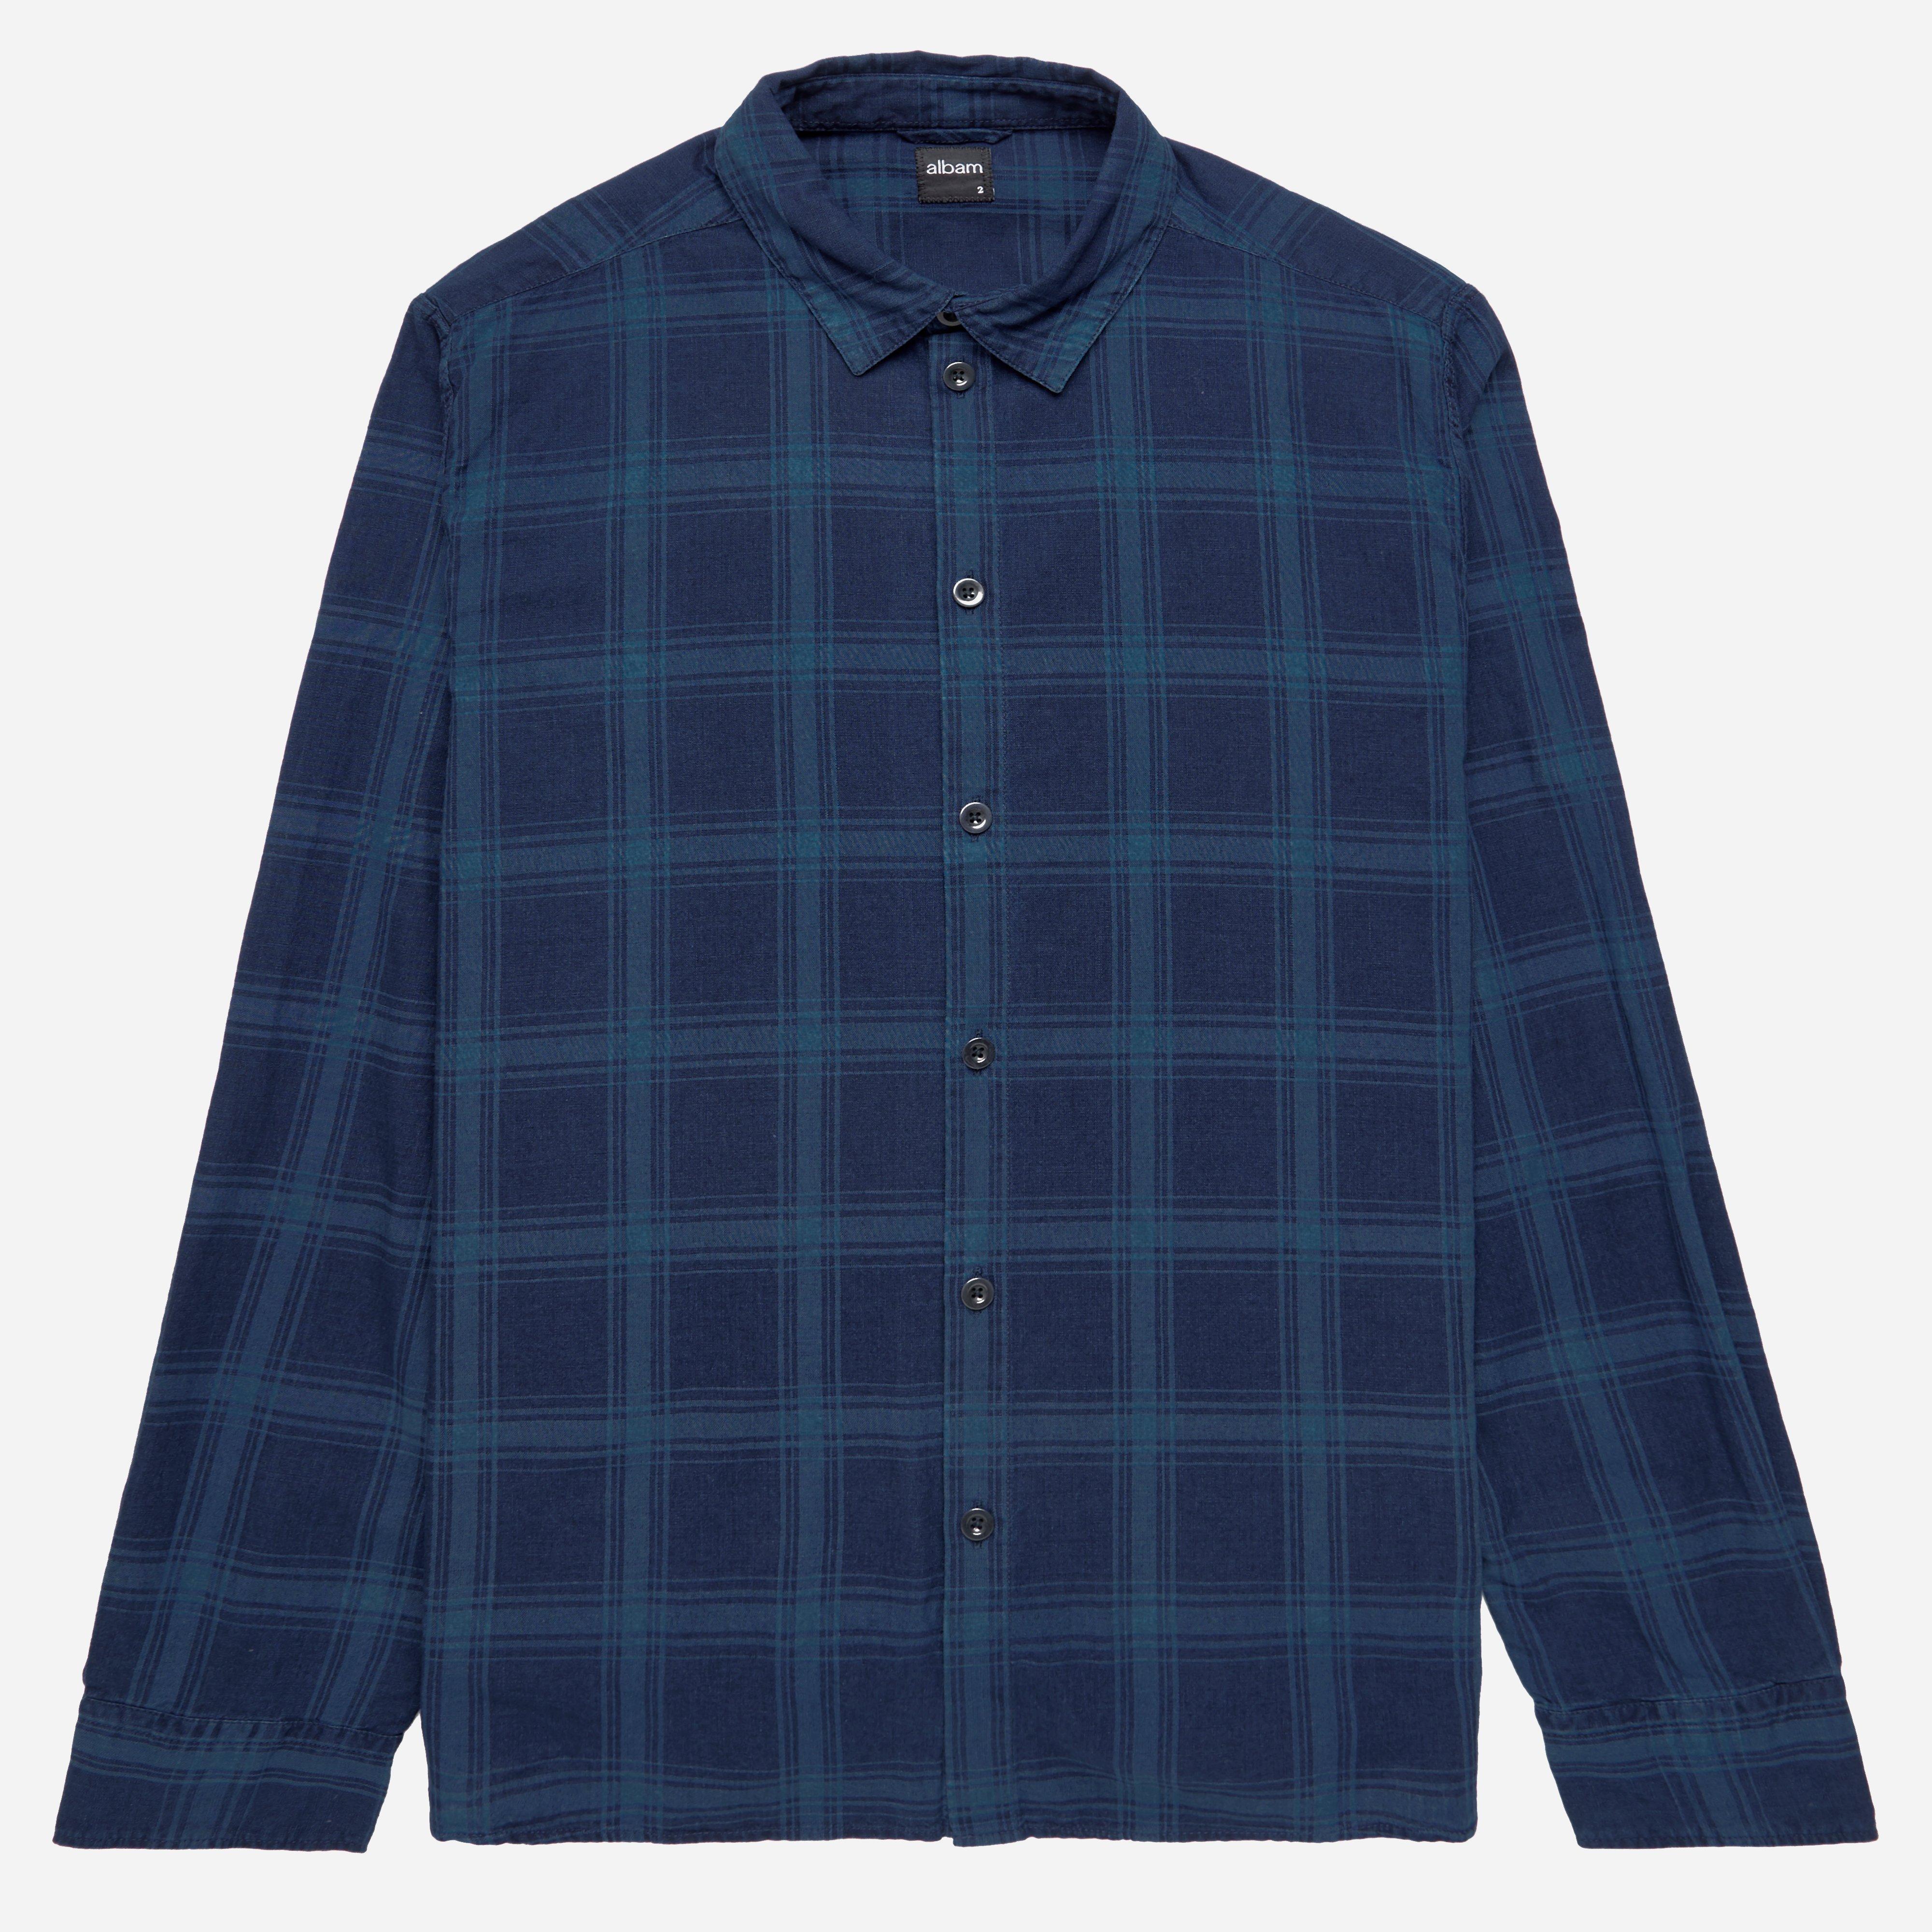 Albam Easy Shirt